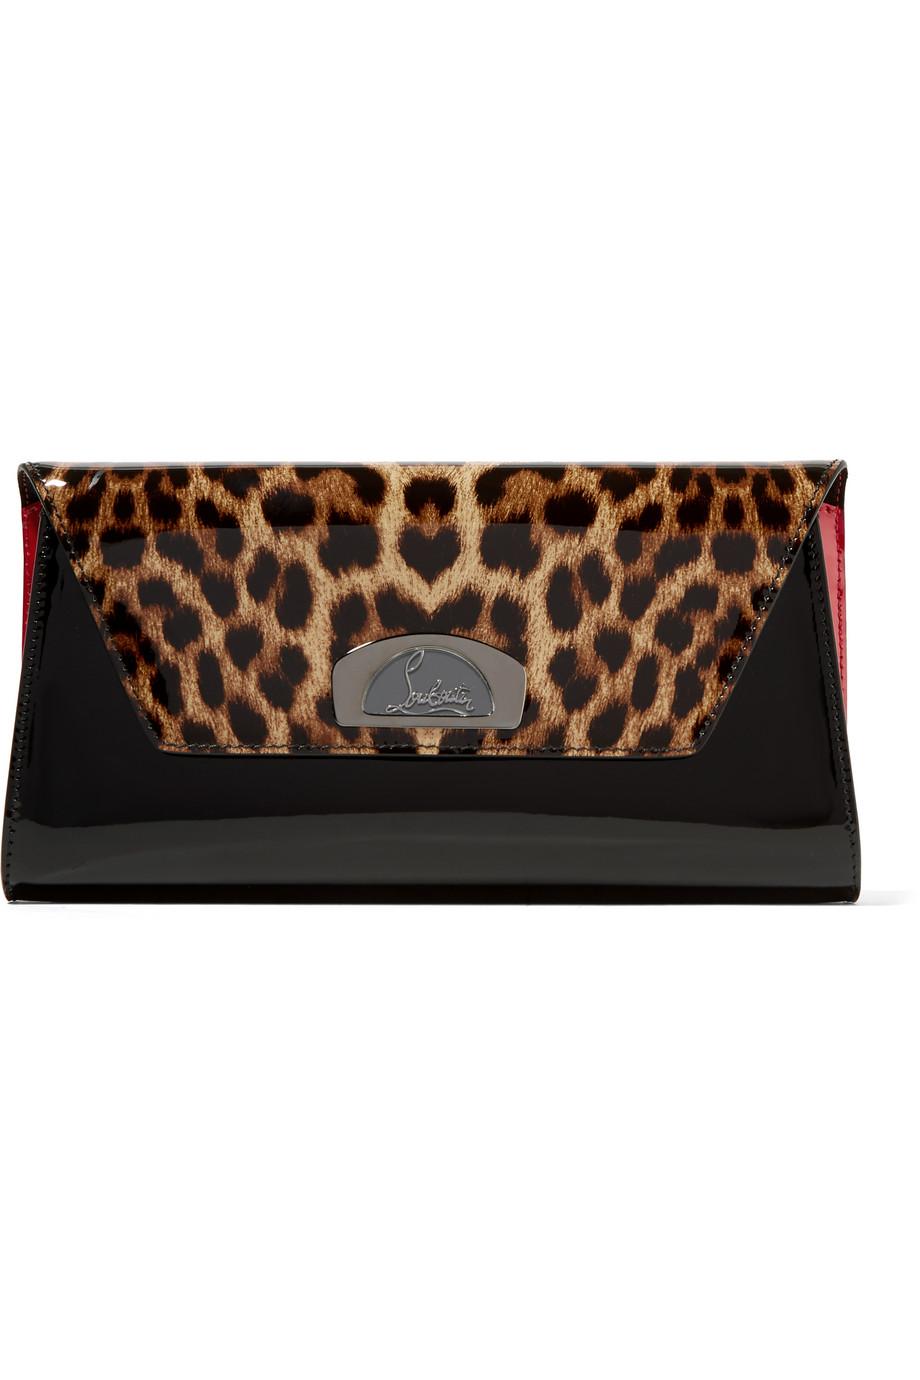 Christian Louboutin Vero Dodat Leopard-Print Patent-Leather Clutch, Black, Women's